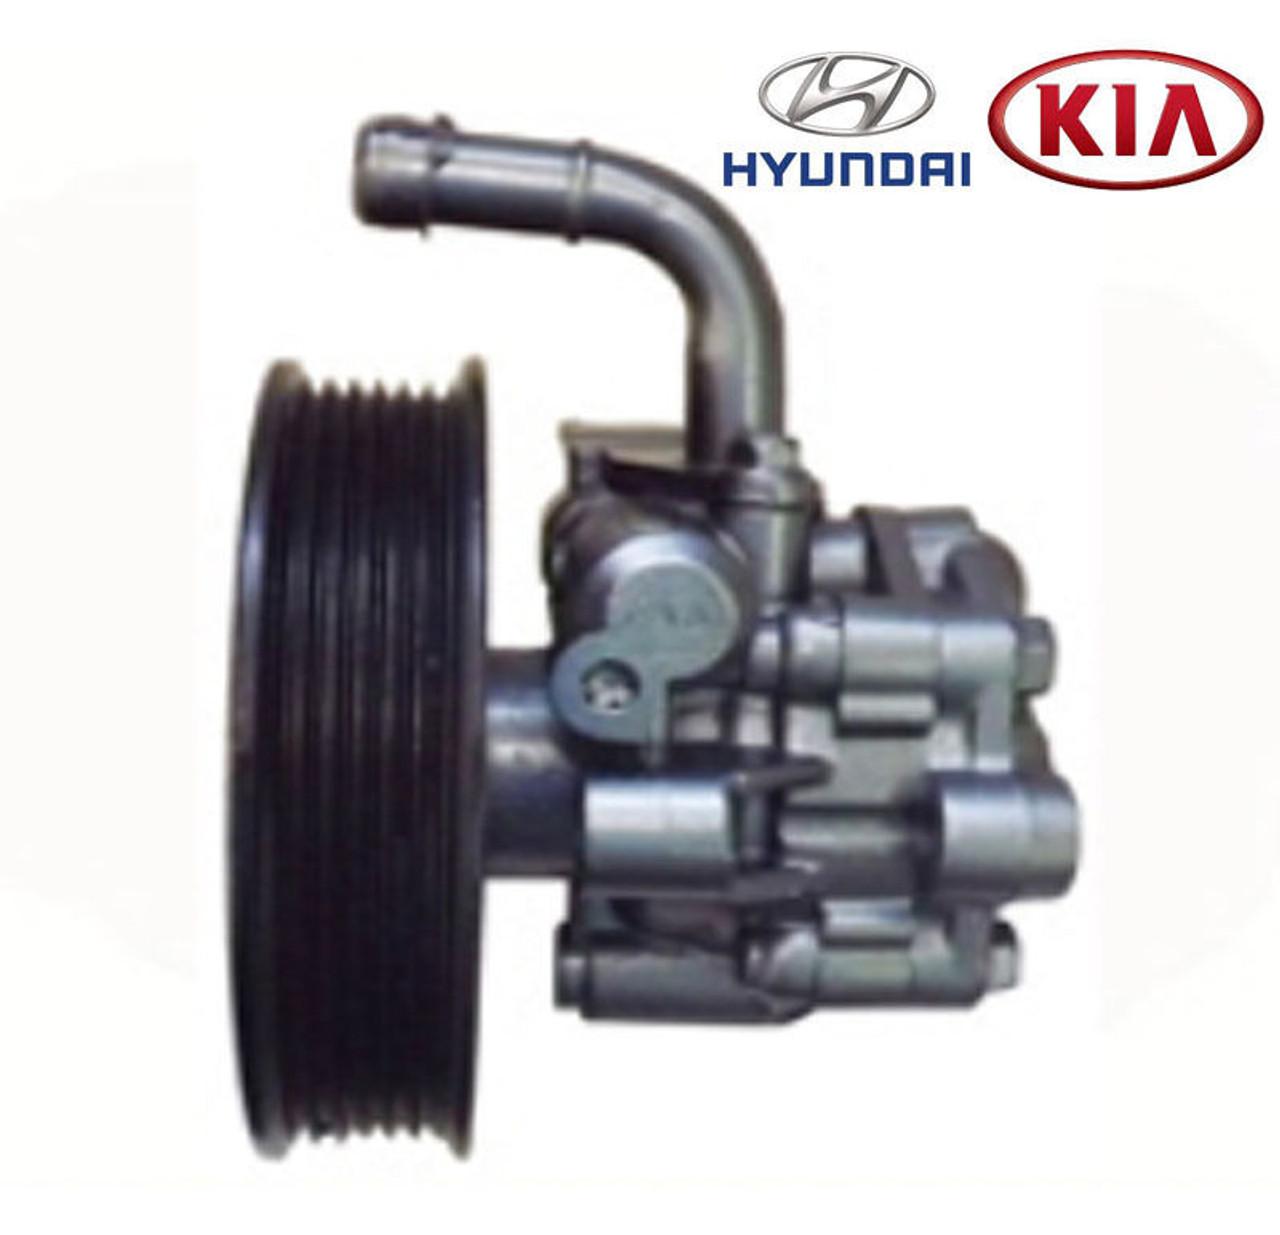 New Power steering oil pump 571002E200 57100 2E200 for Hyundai Tucson